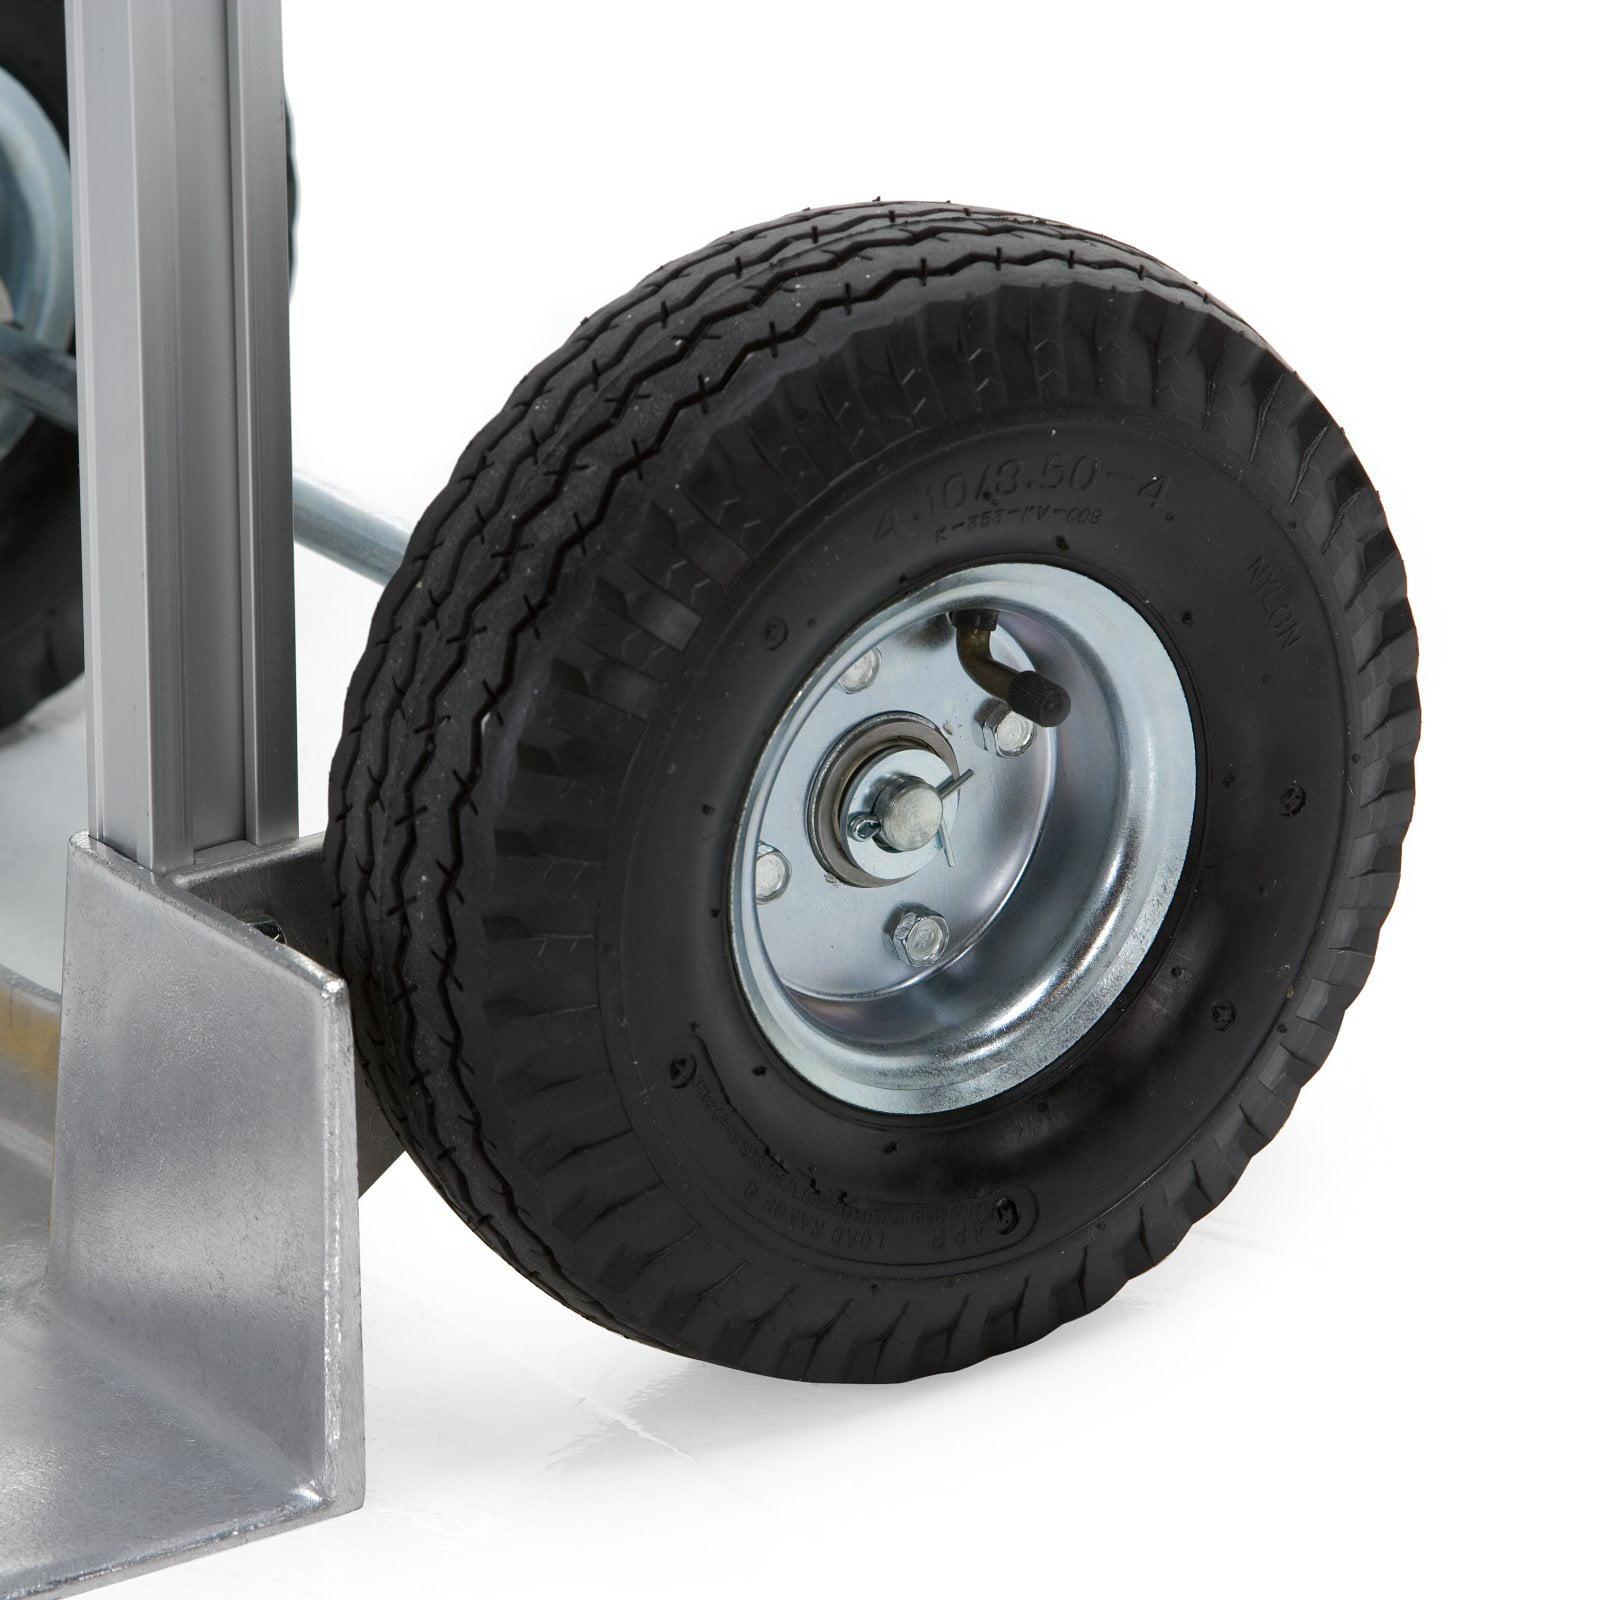 Wesco Spartan SR Convertible Hand Truck Walmart